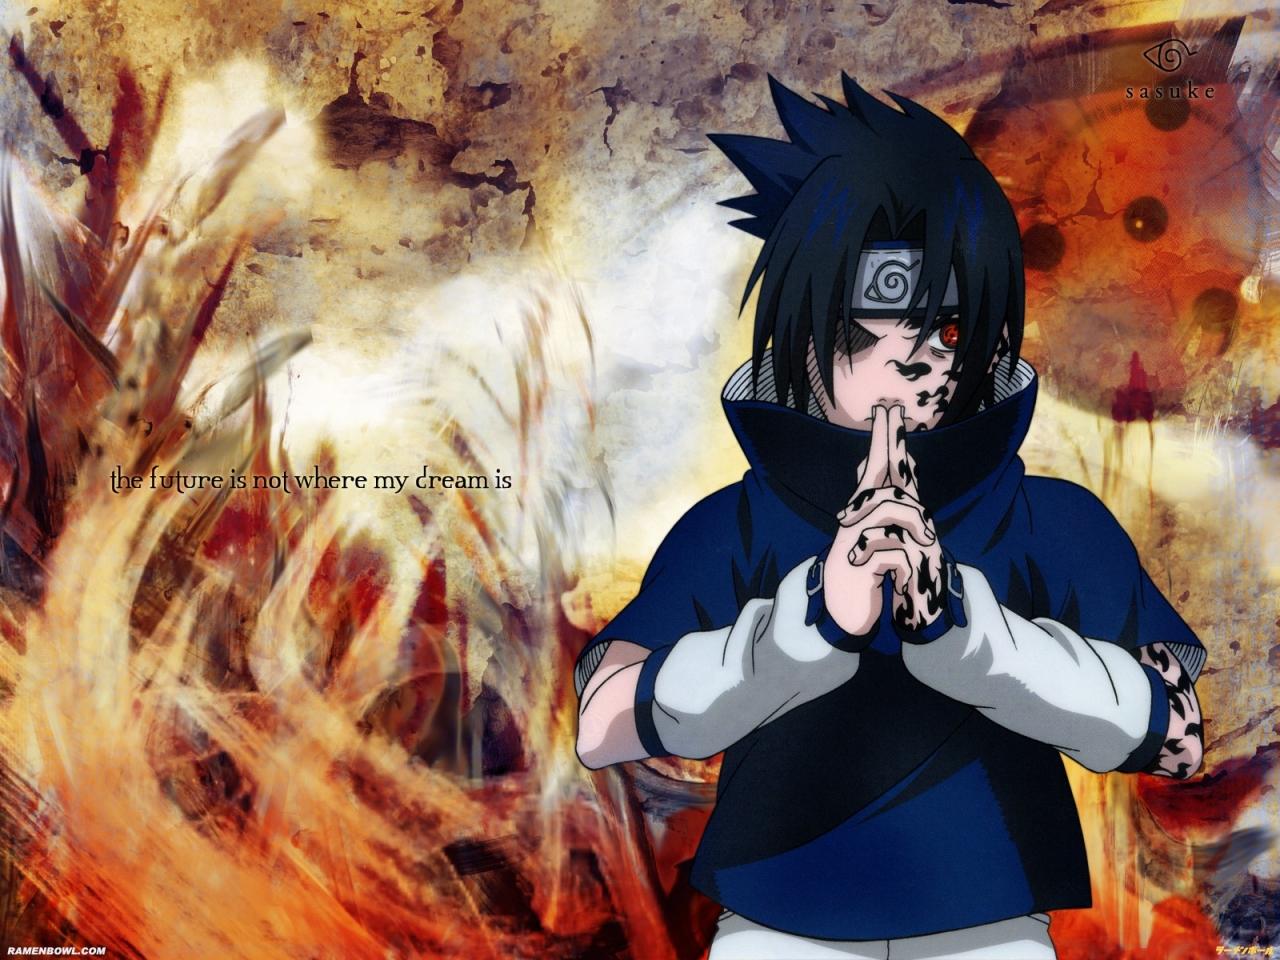 Naruto Shippuuden images Narutos Hatred Against Sasuke wallpaper 1280x960